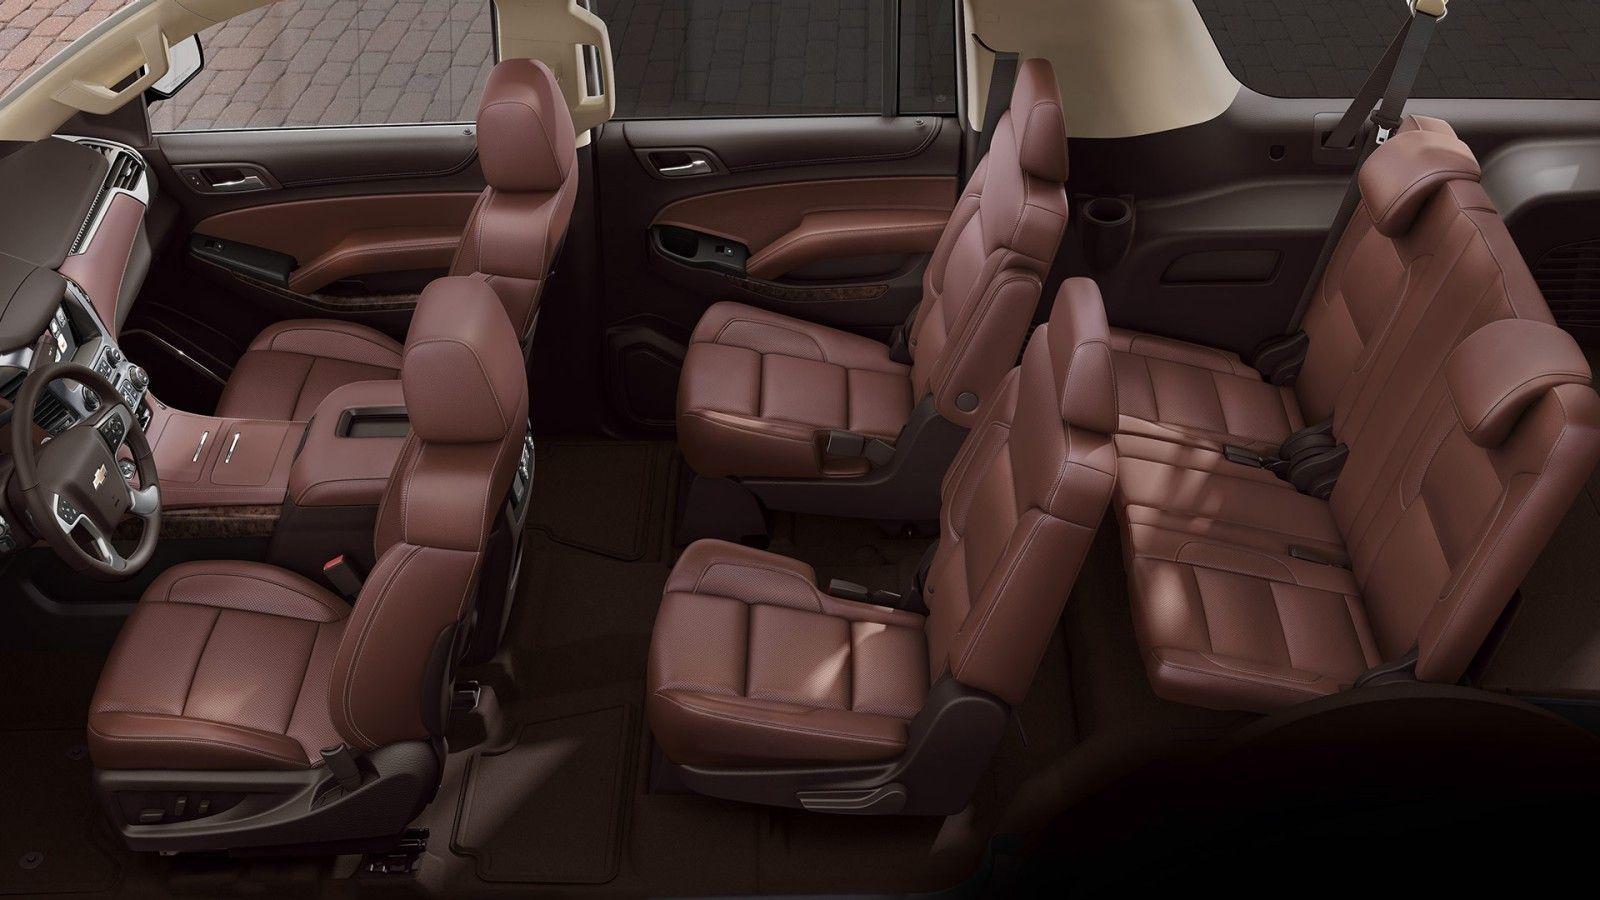 Chevrolet 2015 Suburban Interieur Chevrolet Suburban Vehicules Eje